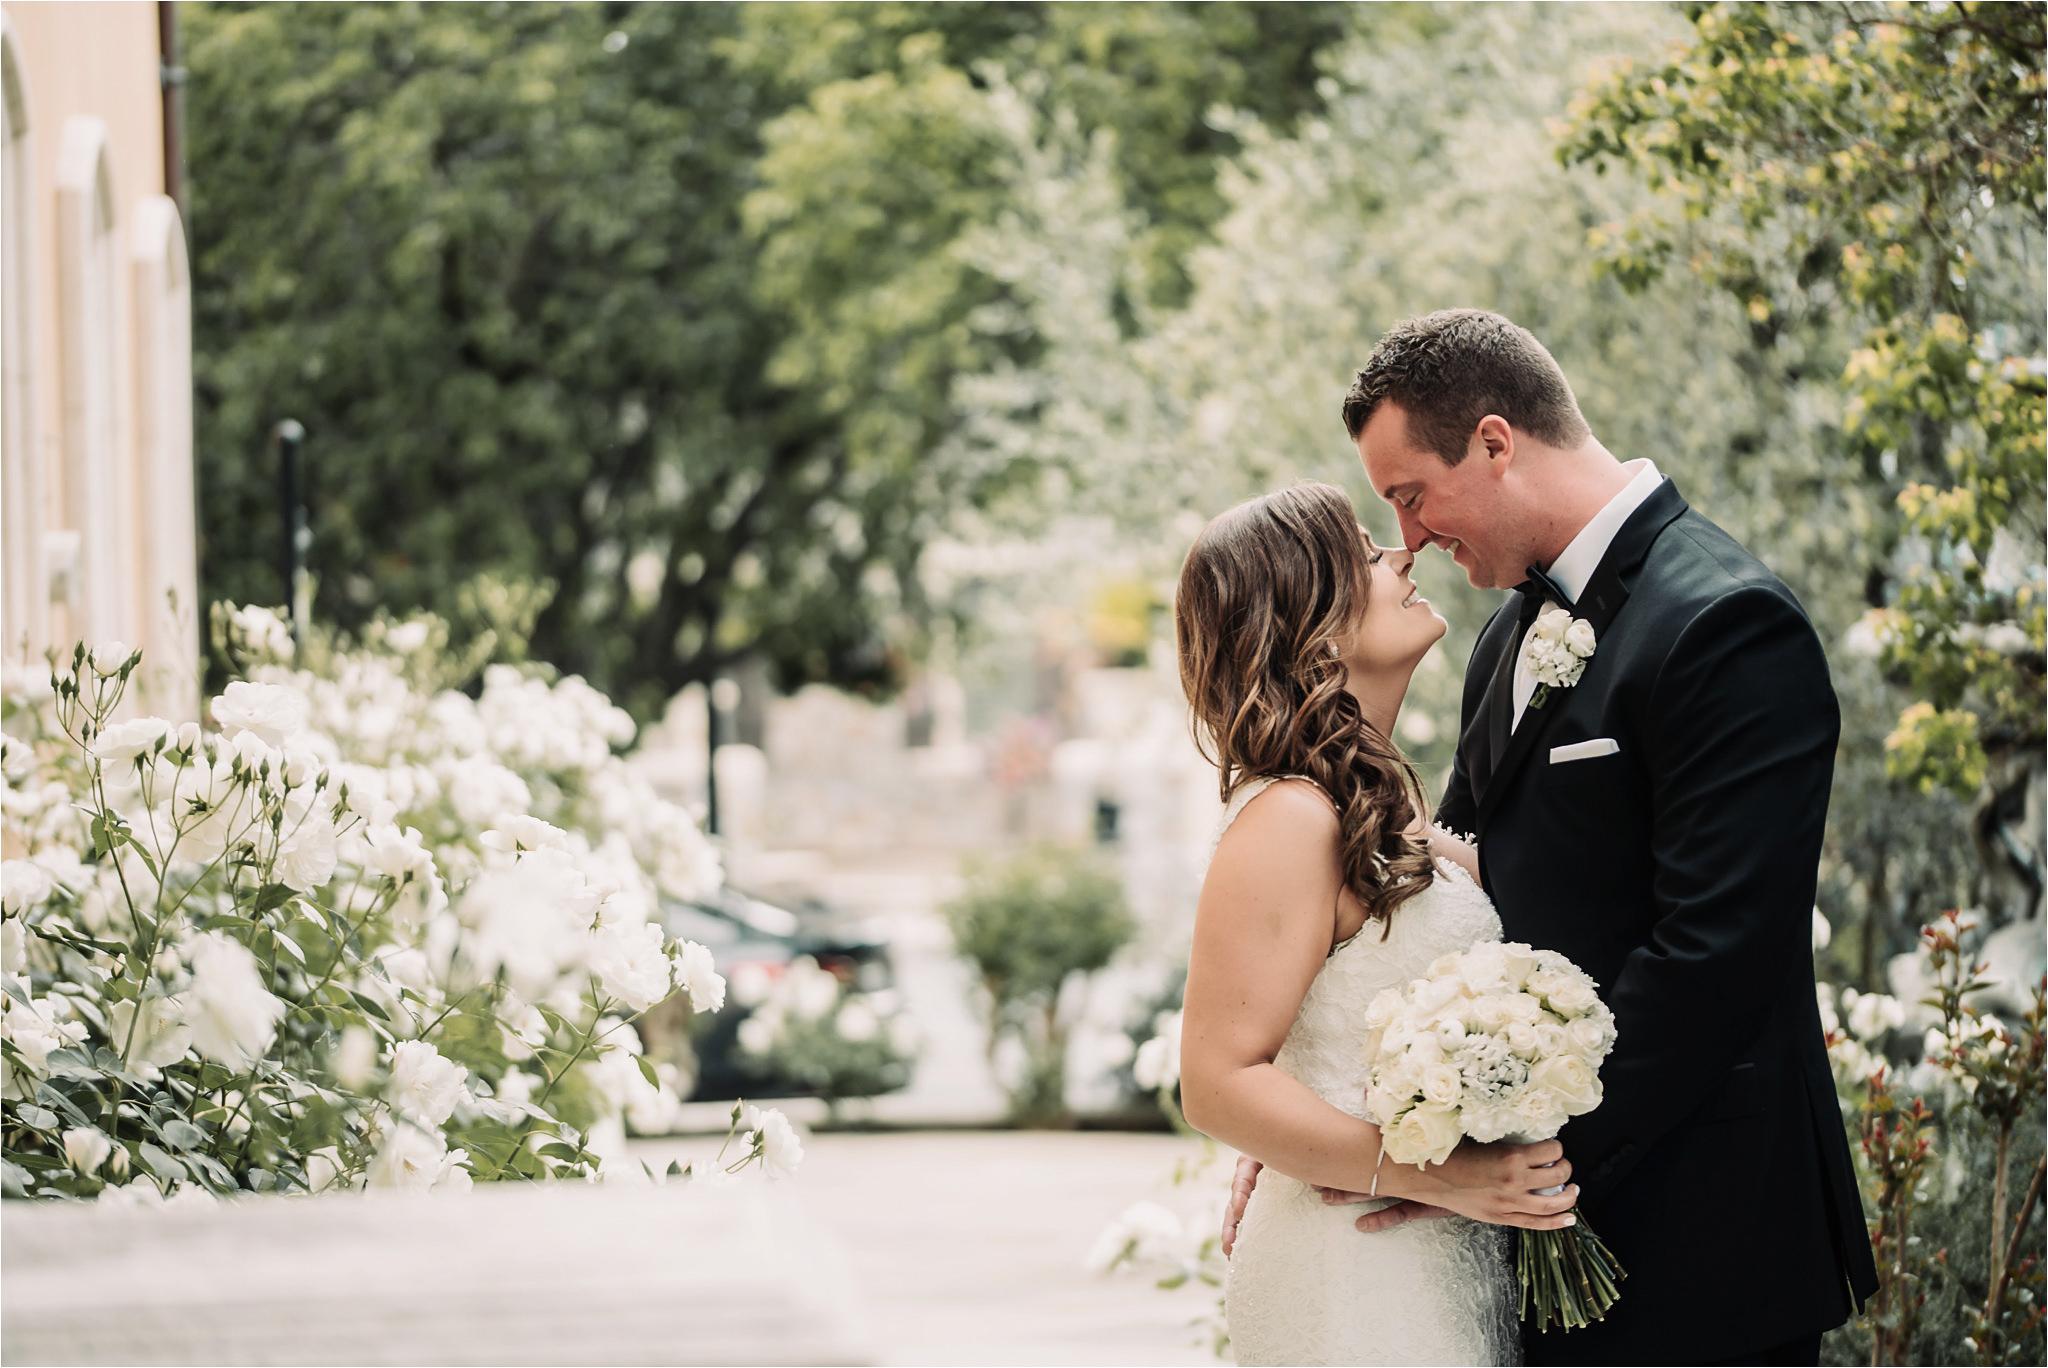 jessica-roman-photography-arden hills wedding photograpger-sacramento-boise-14.jpg